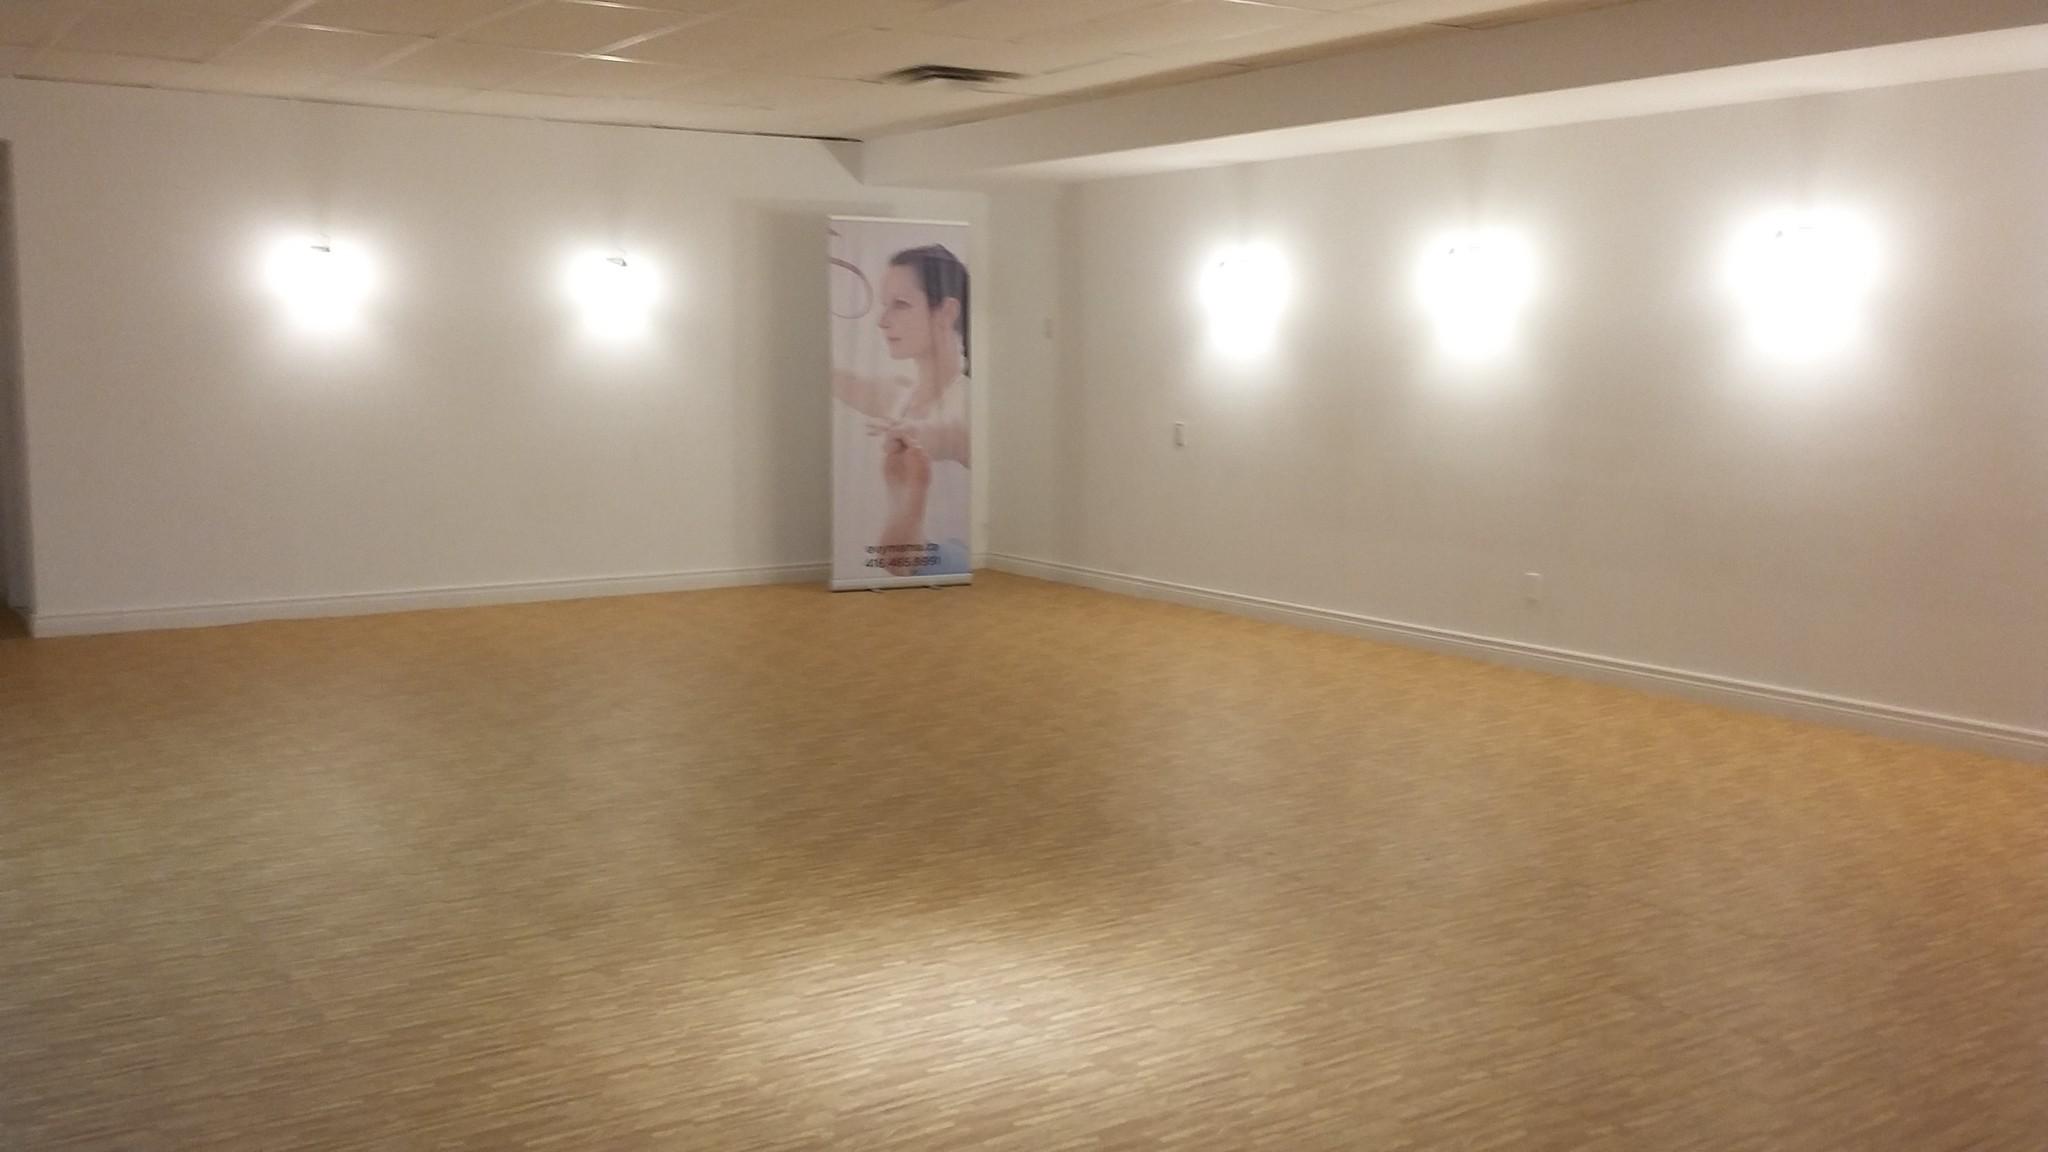 Rent Studio Space In Toronto At Evymama Evymama Nursing